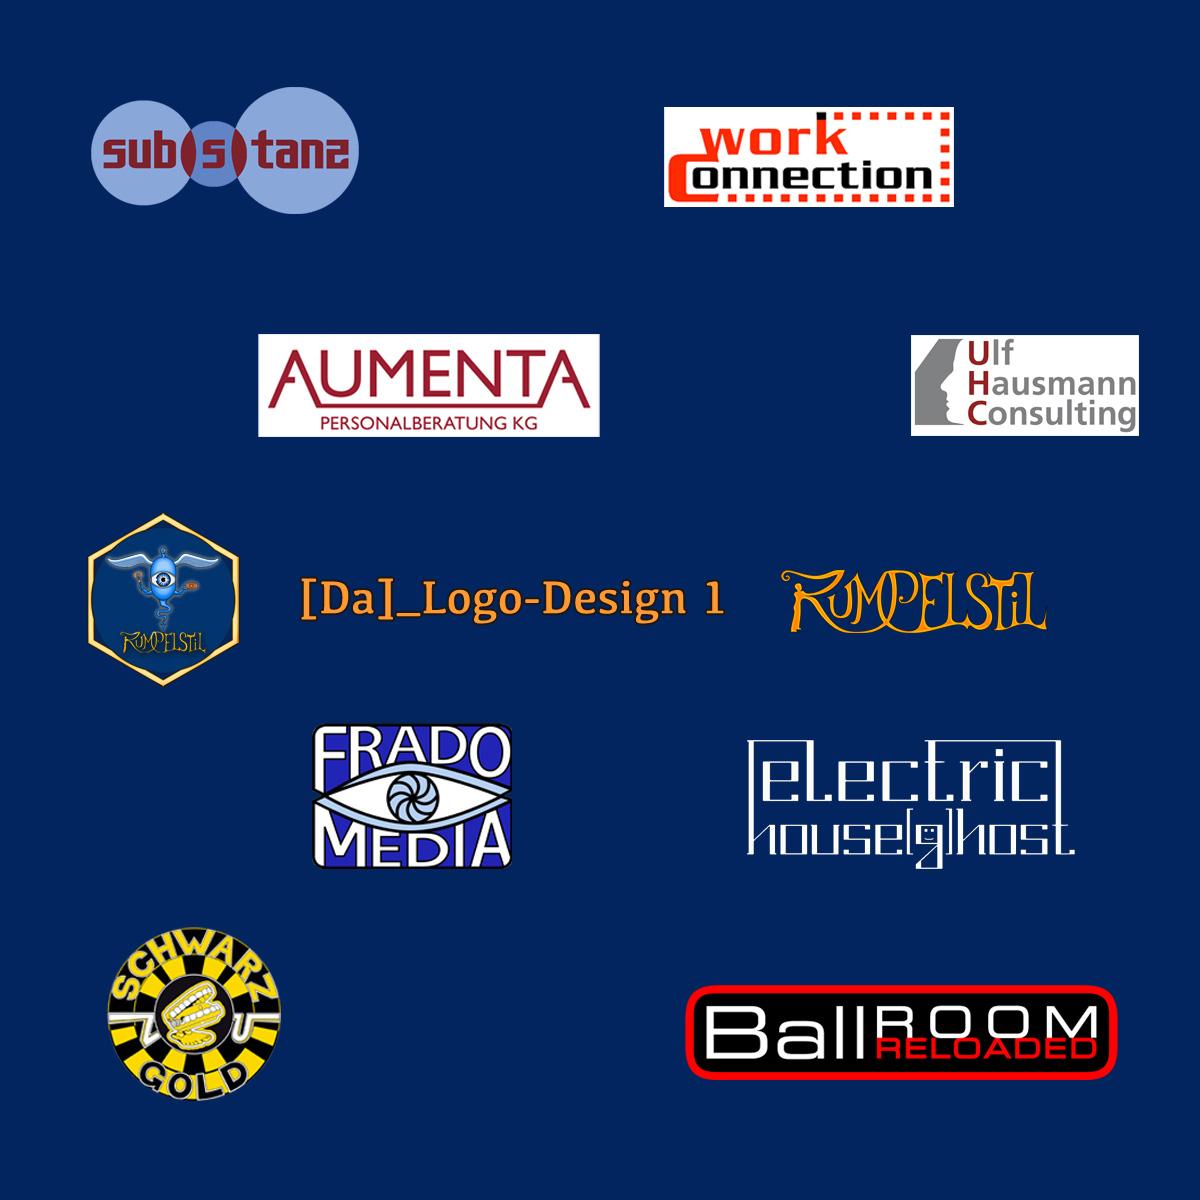 [Da]_Logo Design 1